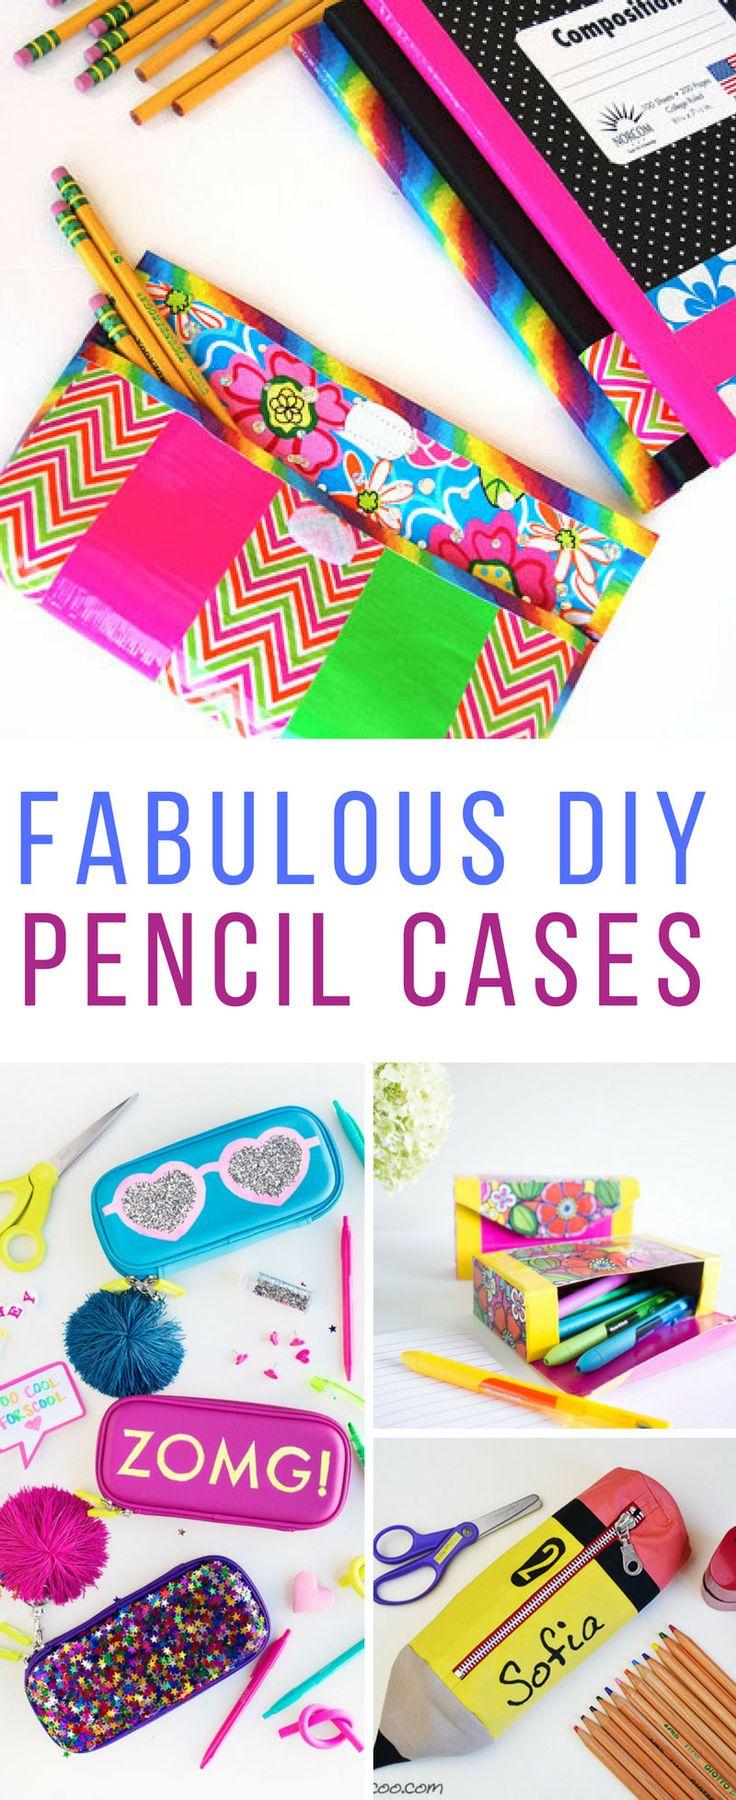 Loving these DIY pencil cases!